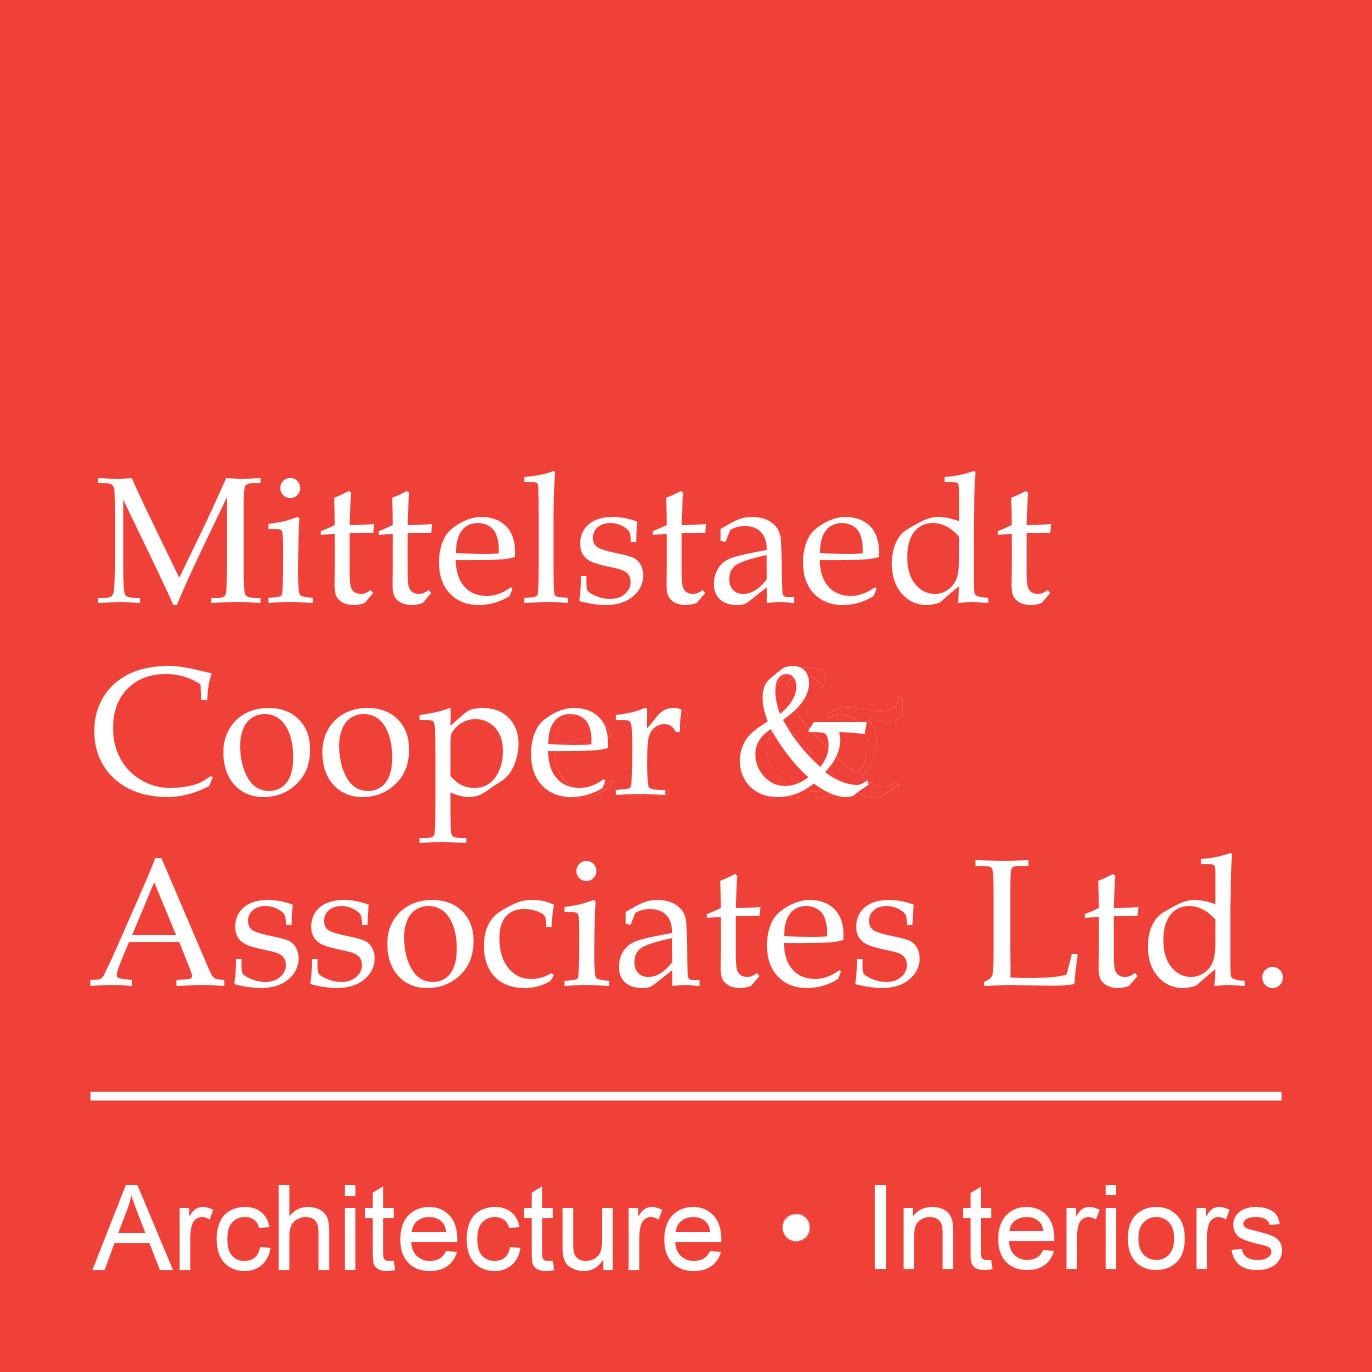 Architecture & Interiors-Mittelstaedt Cooper & Associates,Phoenix